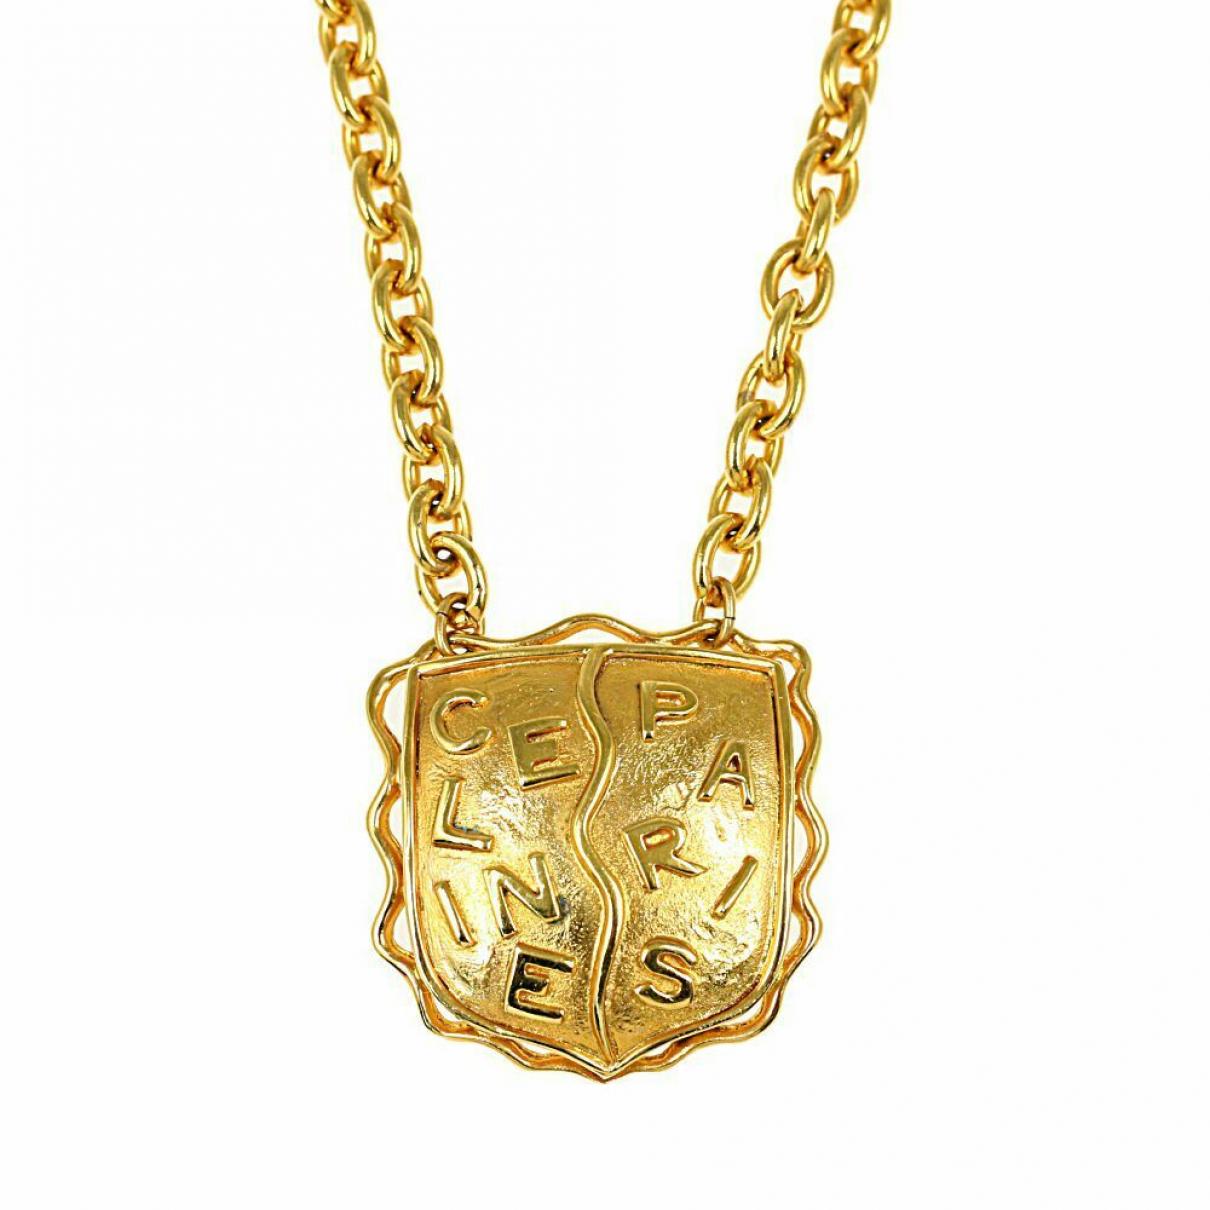 Celine \N necklace for Women \N